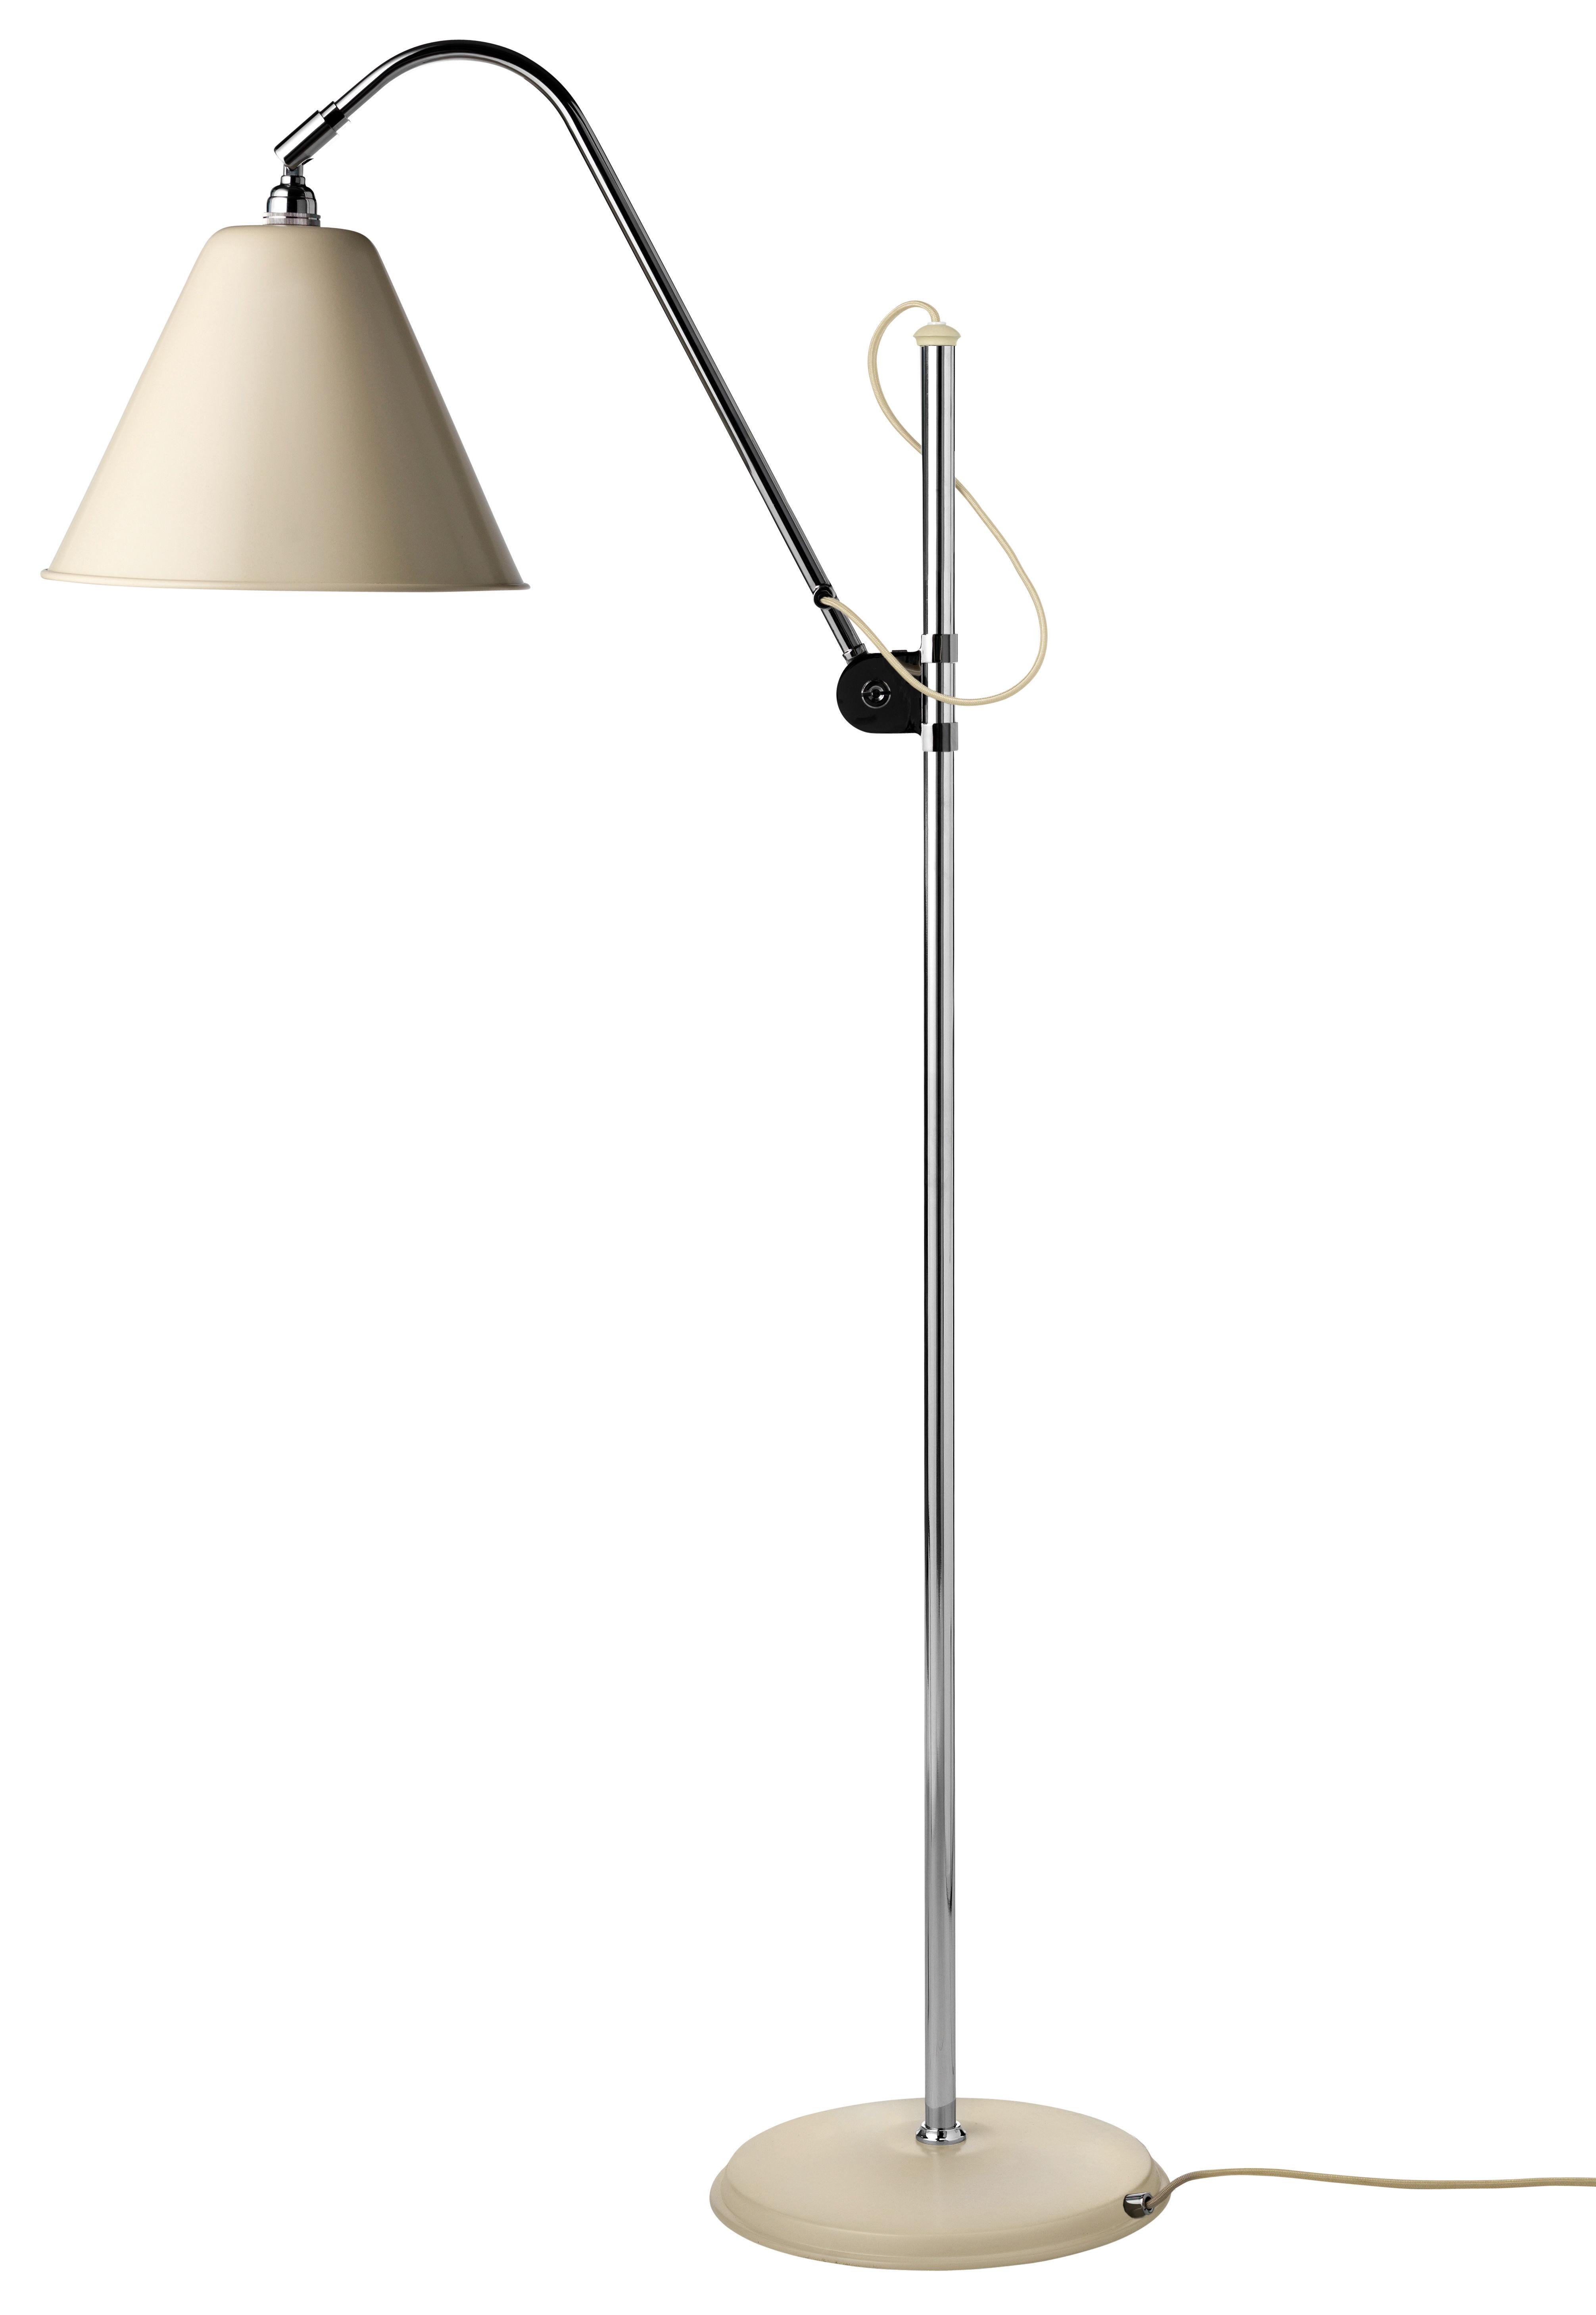 lampadaire bestlite bl3 original r dition de 1930 cr me gubi. Black Bedroom Furniture Sets. Home Design Ideas